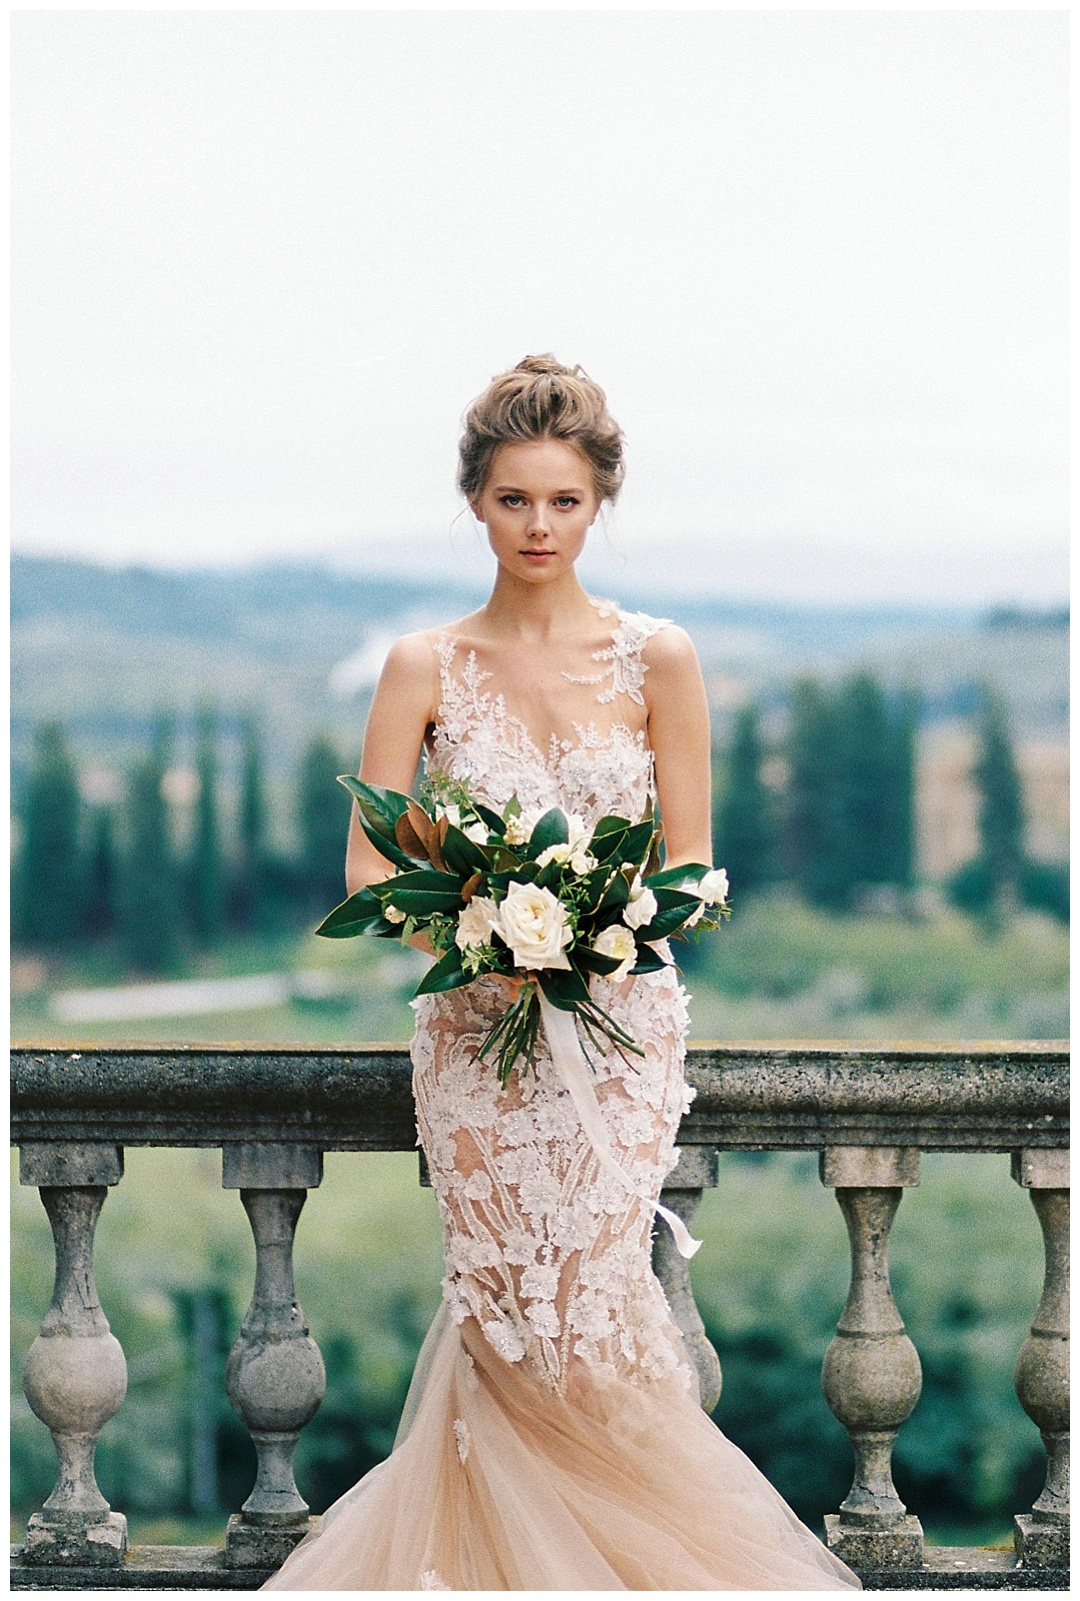 We_Can _Be_Heroes_alternative_wedding_photographer_Tuscany_wedding_film_0045